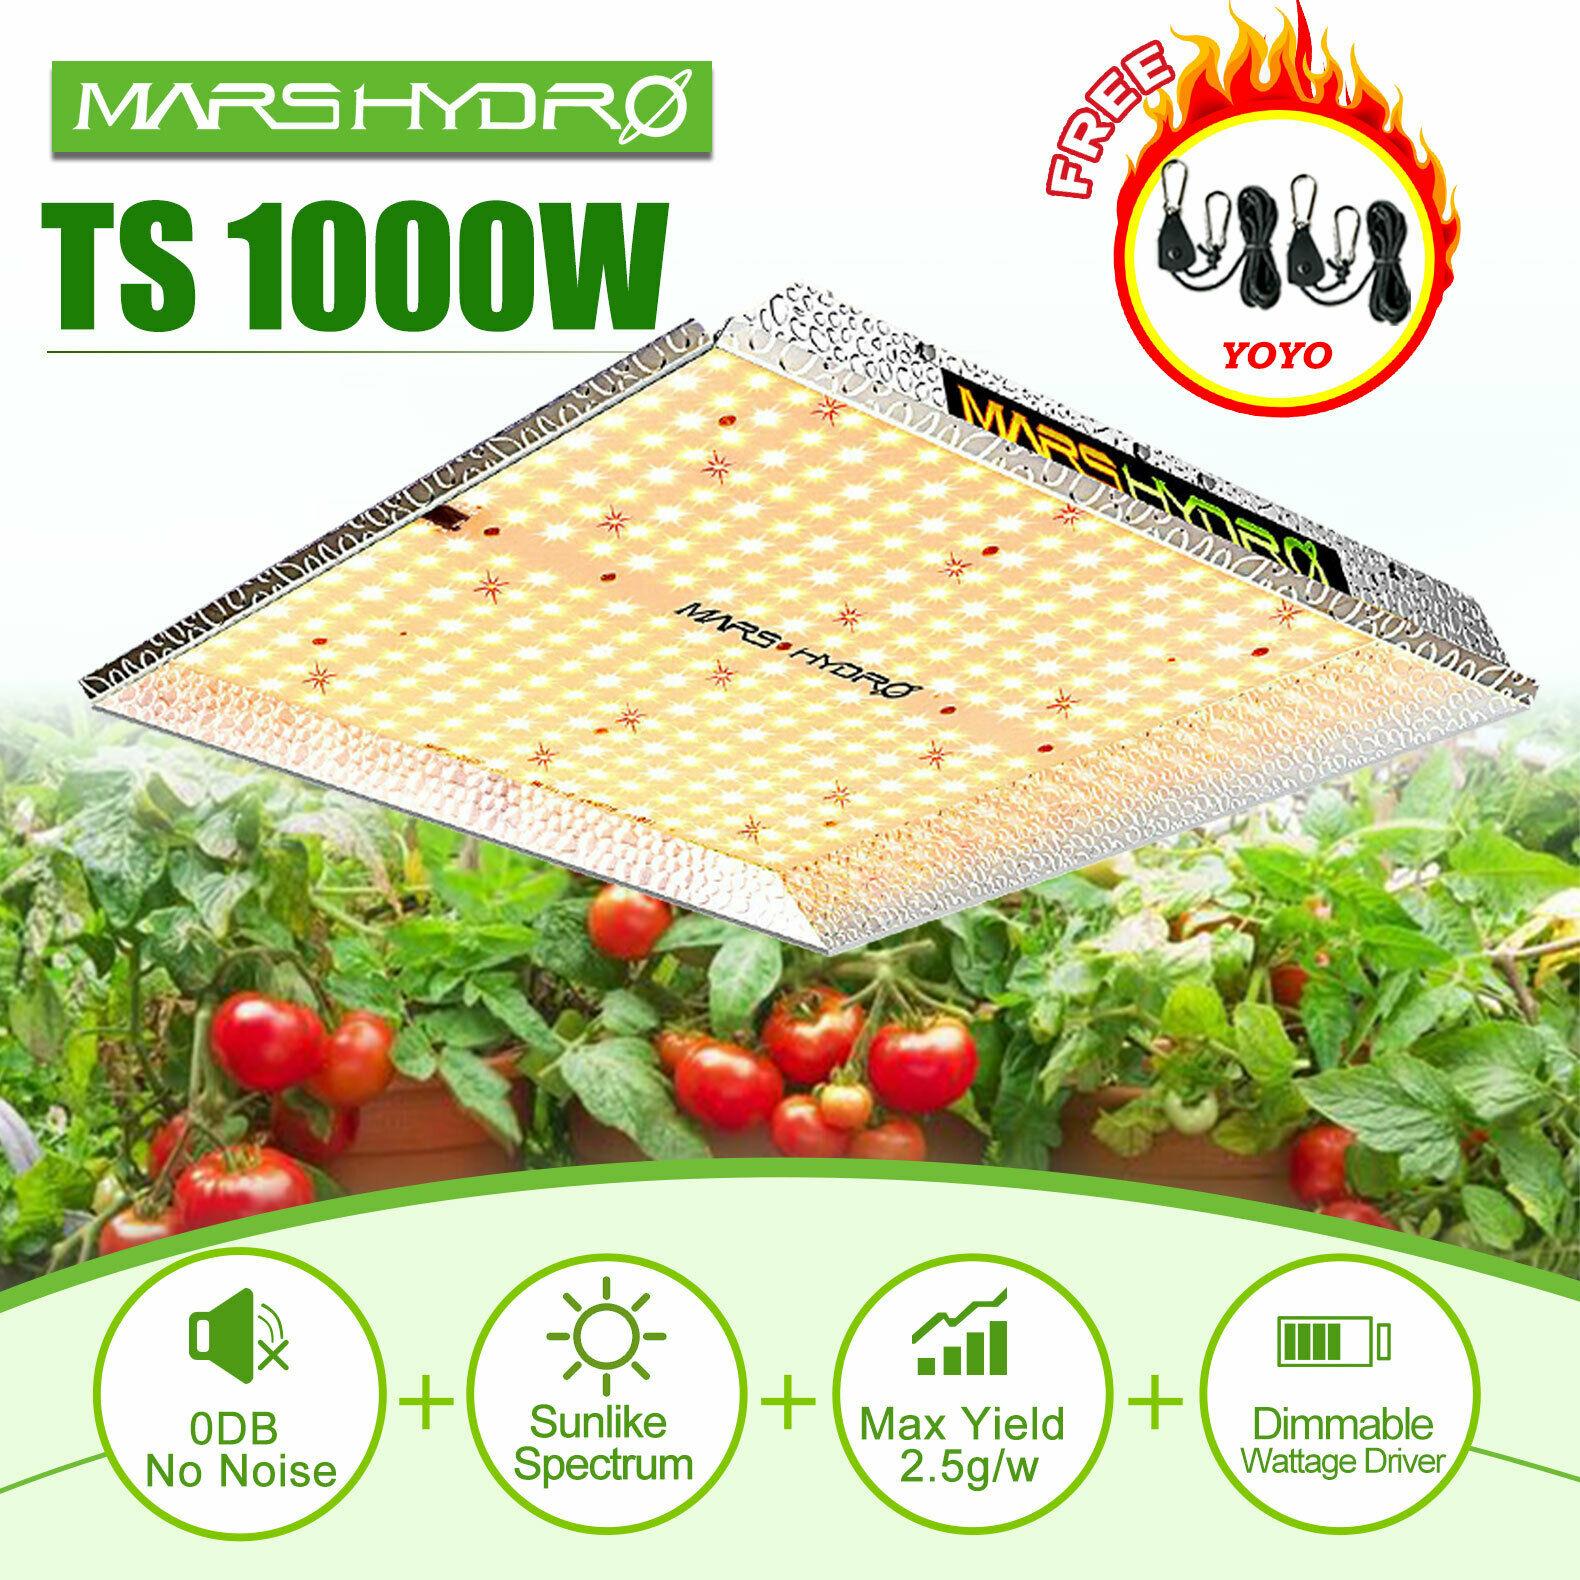 Sale! Mars Hydro TSW 1000W 600W Combo with LED Grow Light Full Spectrum Best for Hydro Plant Veg Flower